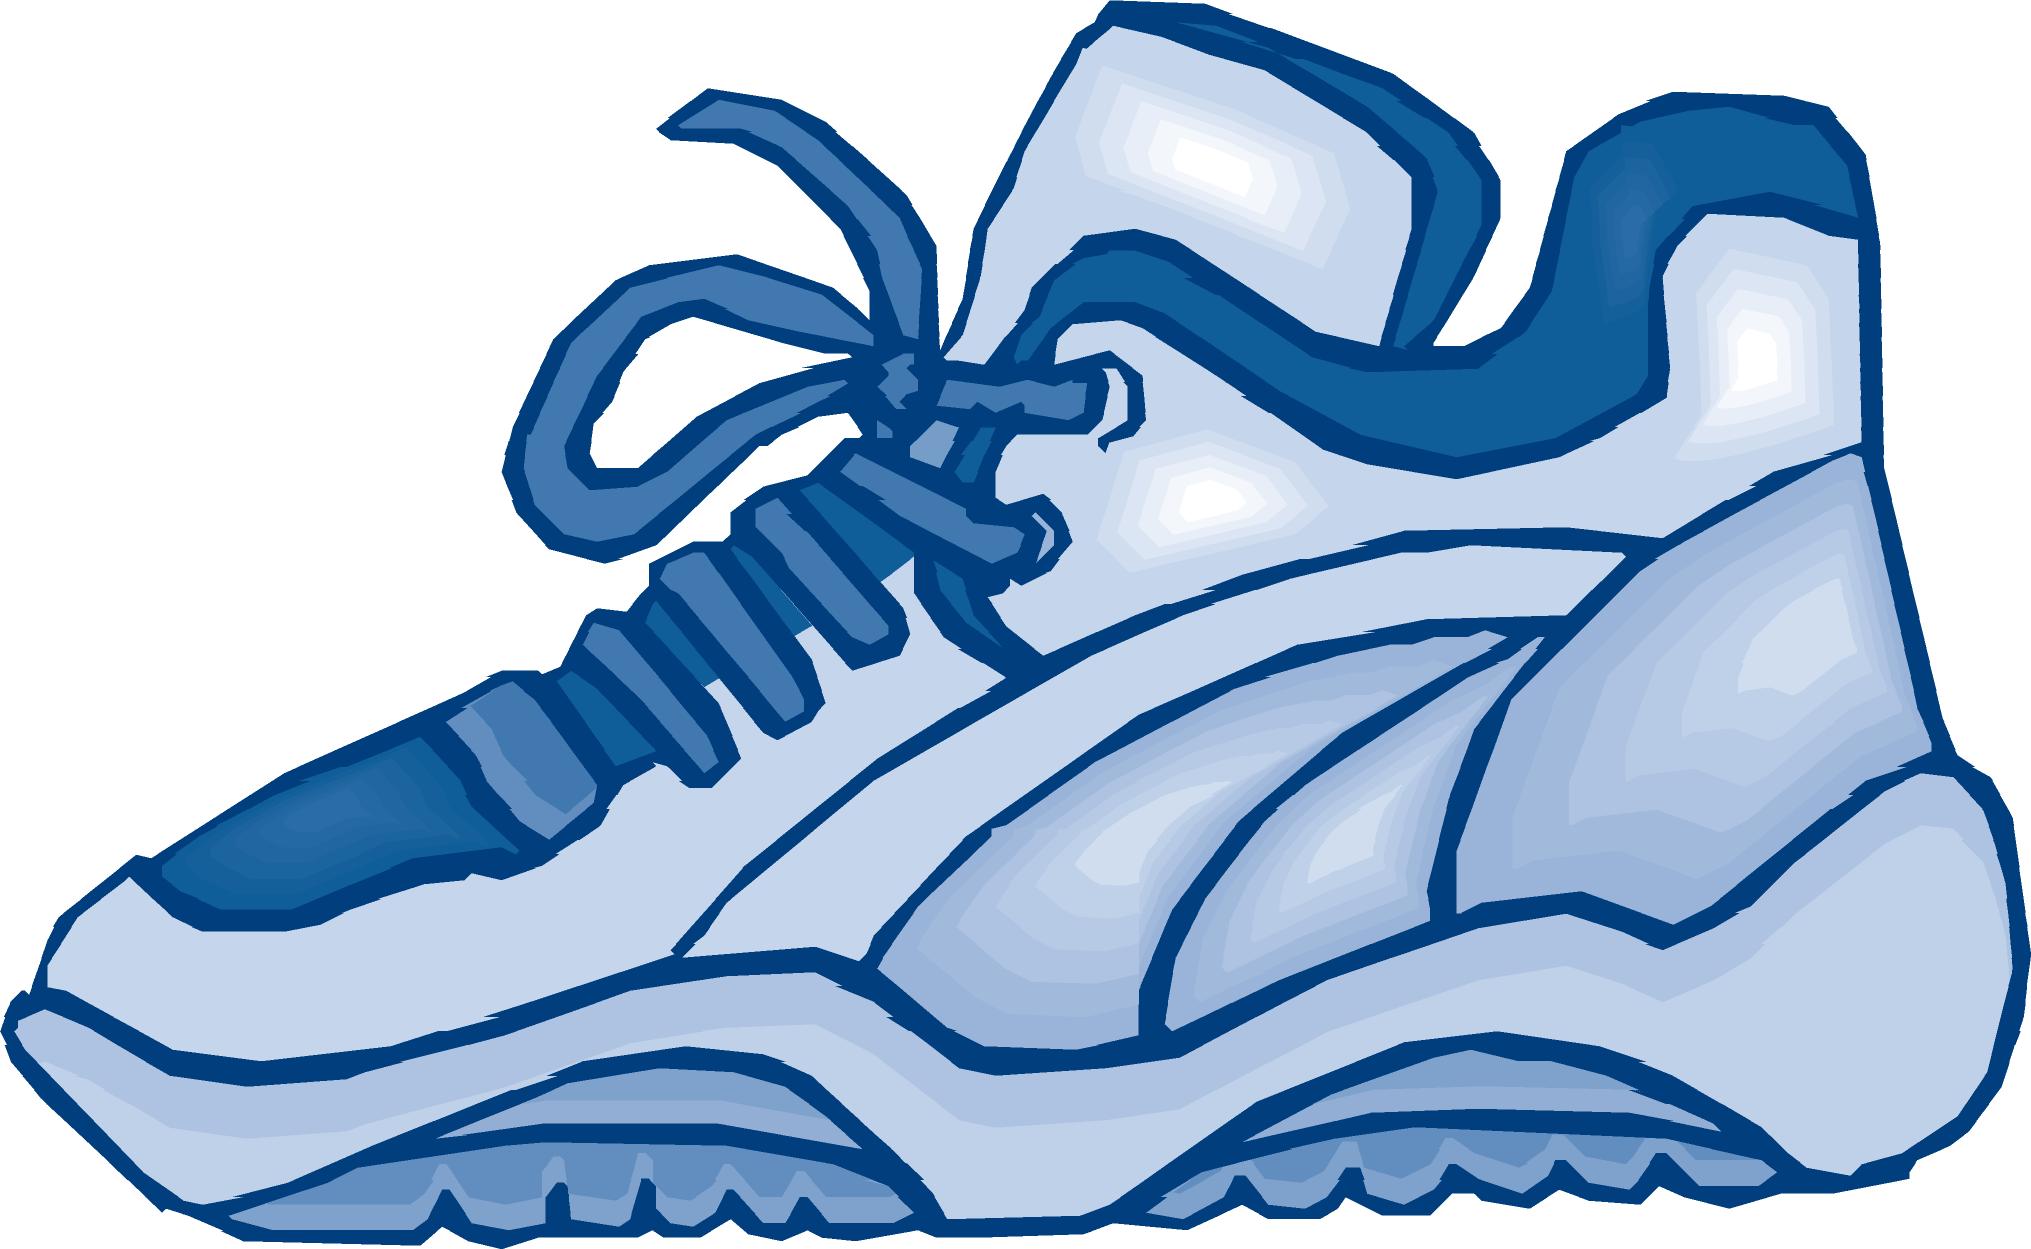 Sneaker shoe clip art gallery clipart clipart image